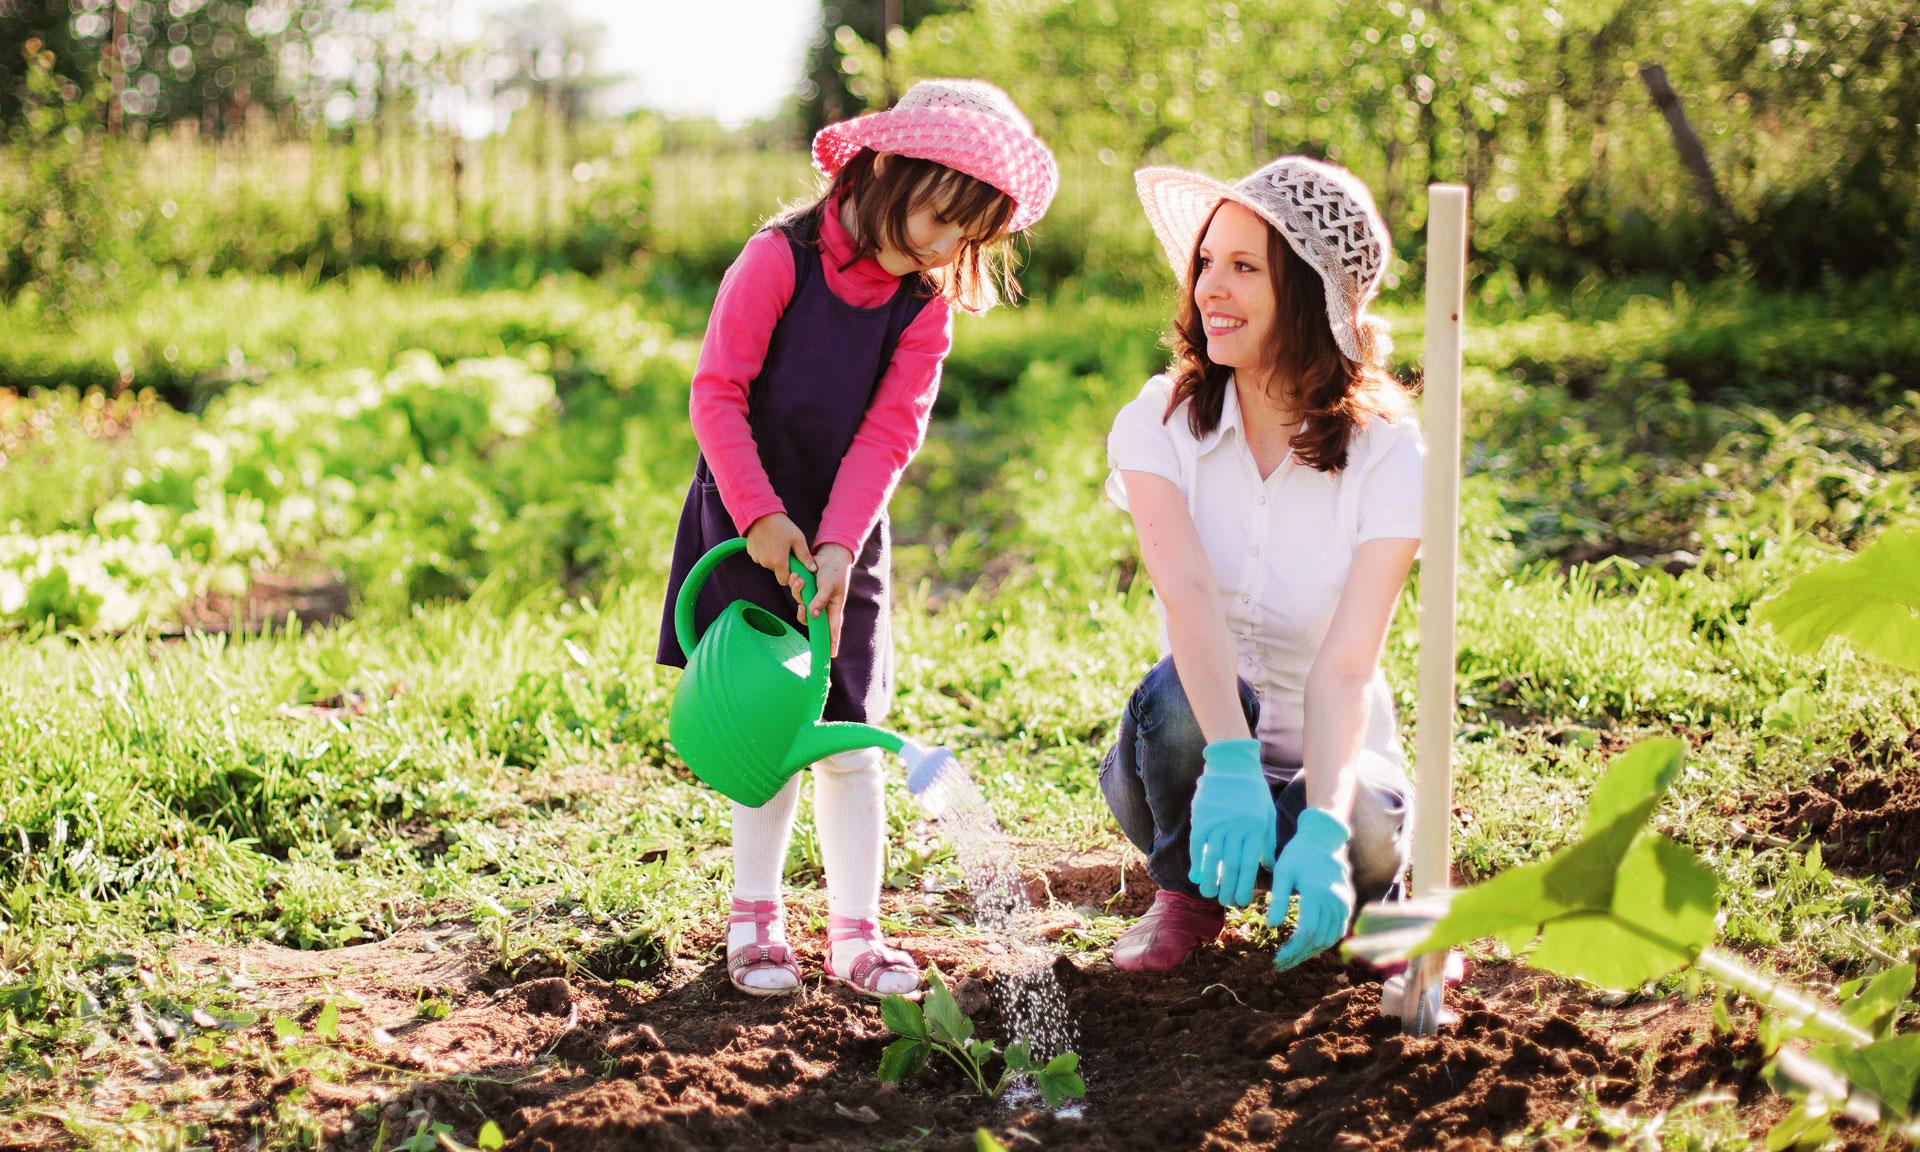 Gardening-with-kids_MAIN_v2